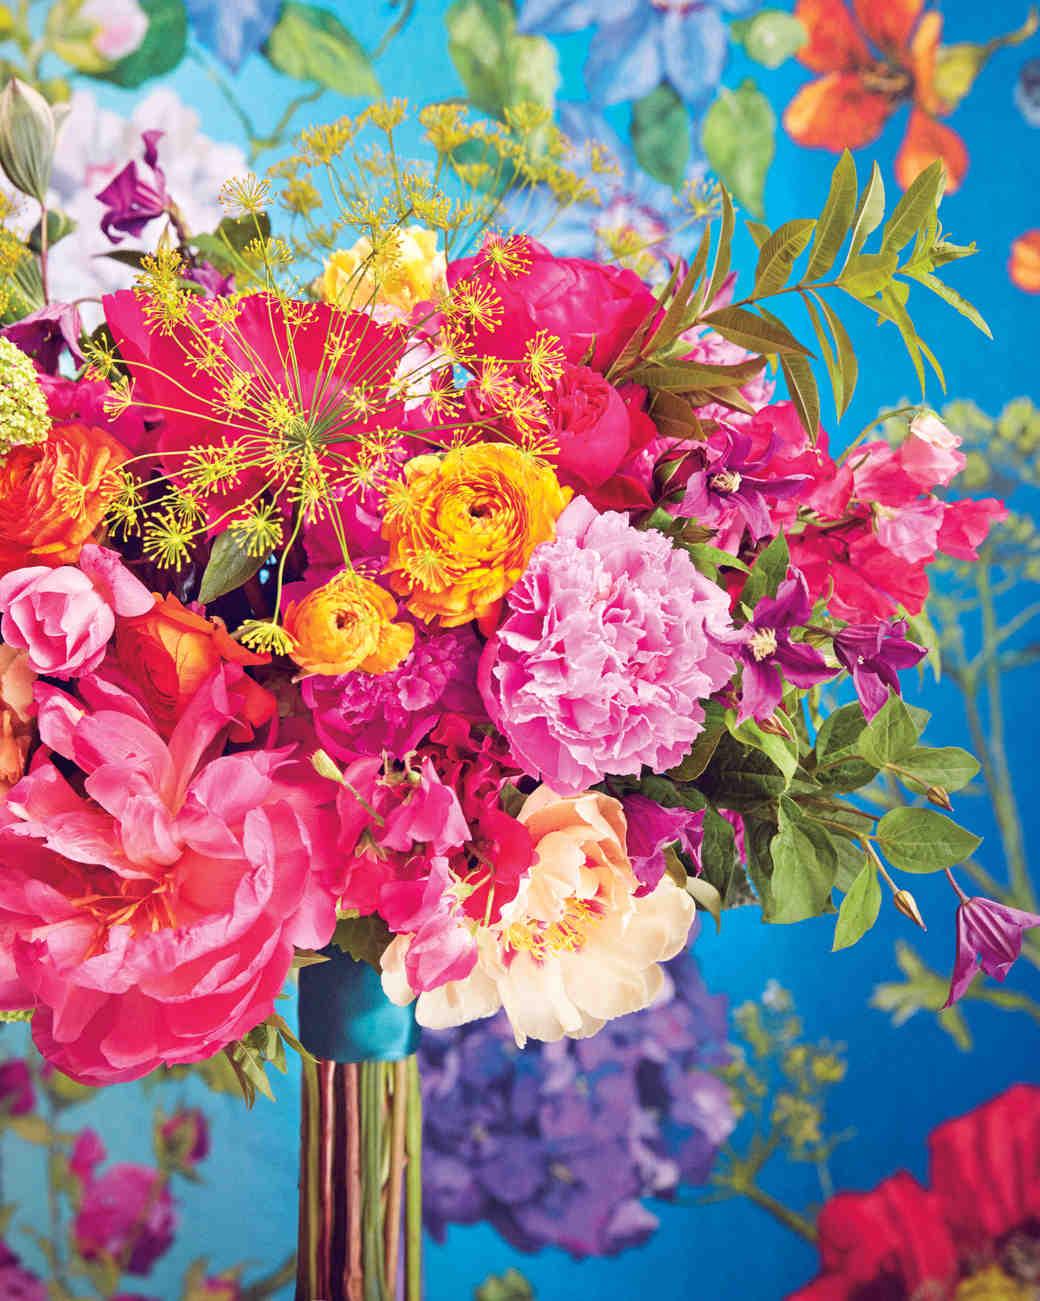 bouquet-openers-v2-0064-d111716.jpg